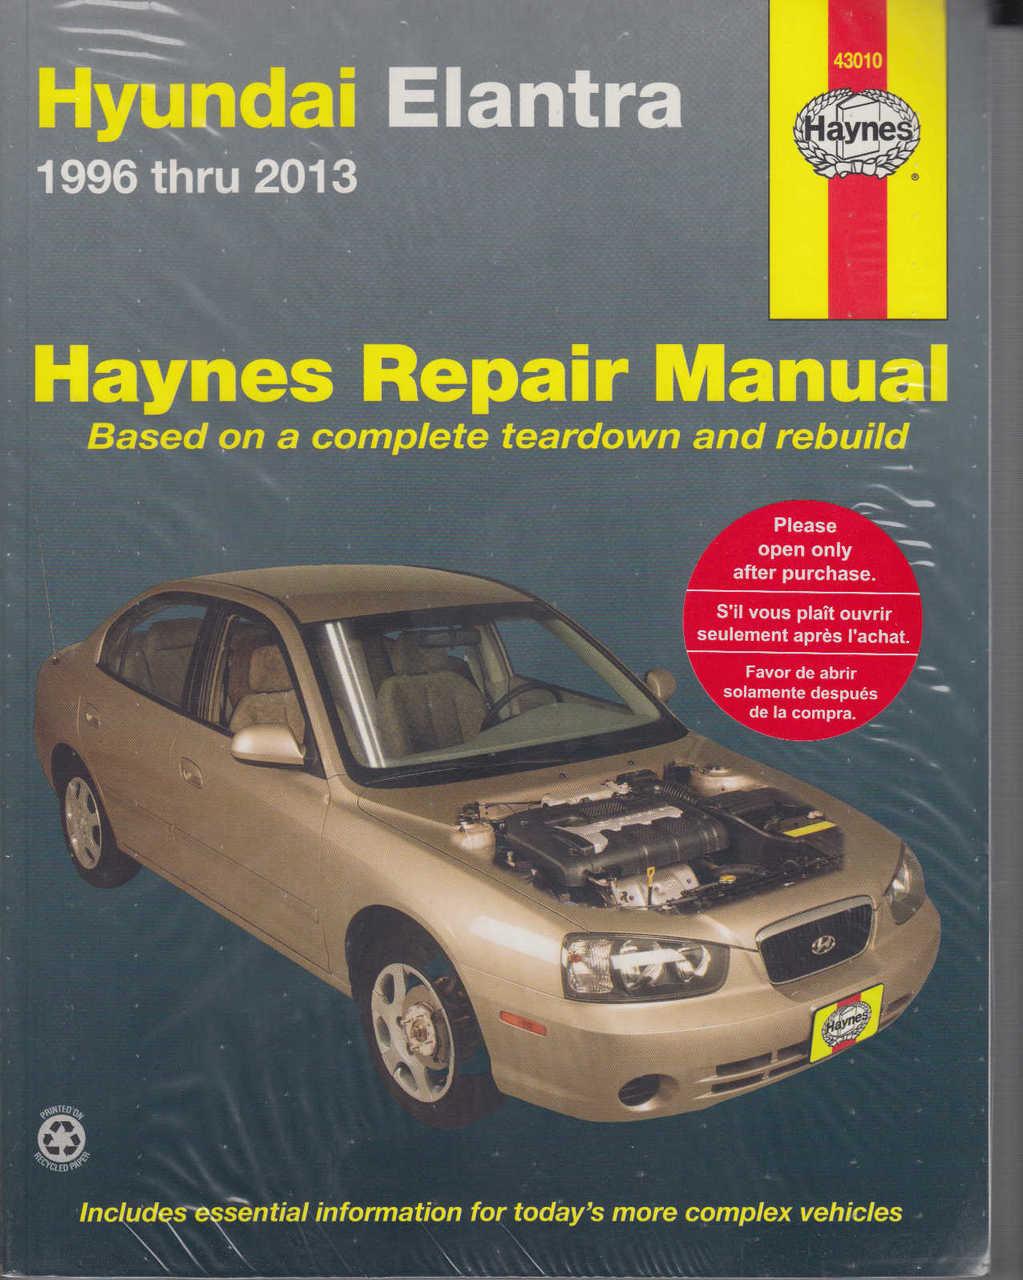 hyundai elantra lantra 1996 2010 workshop manual rh automotobookshop com au  2003 Hyundai Elantra Undercarriage 2003 Hyundai Elantra Undercarriage